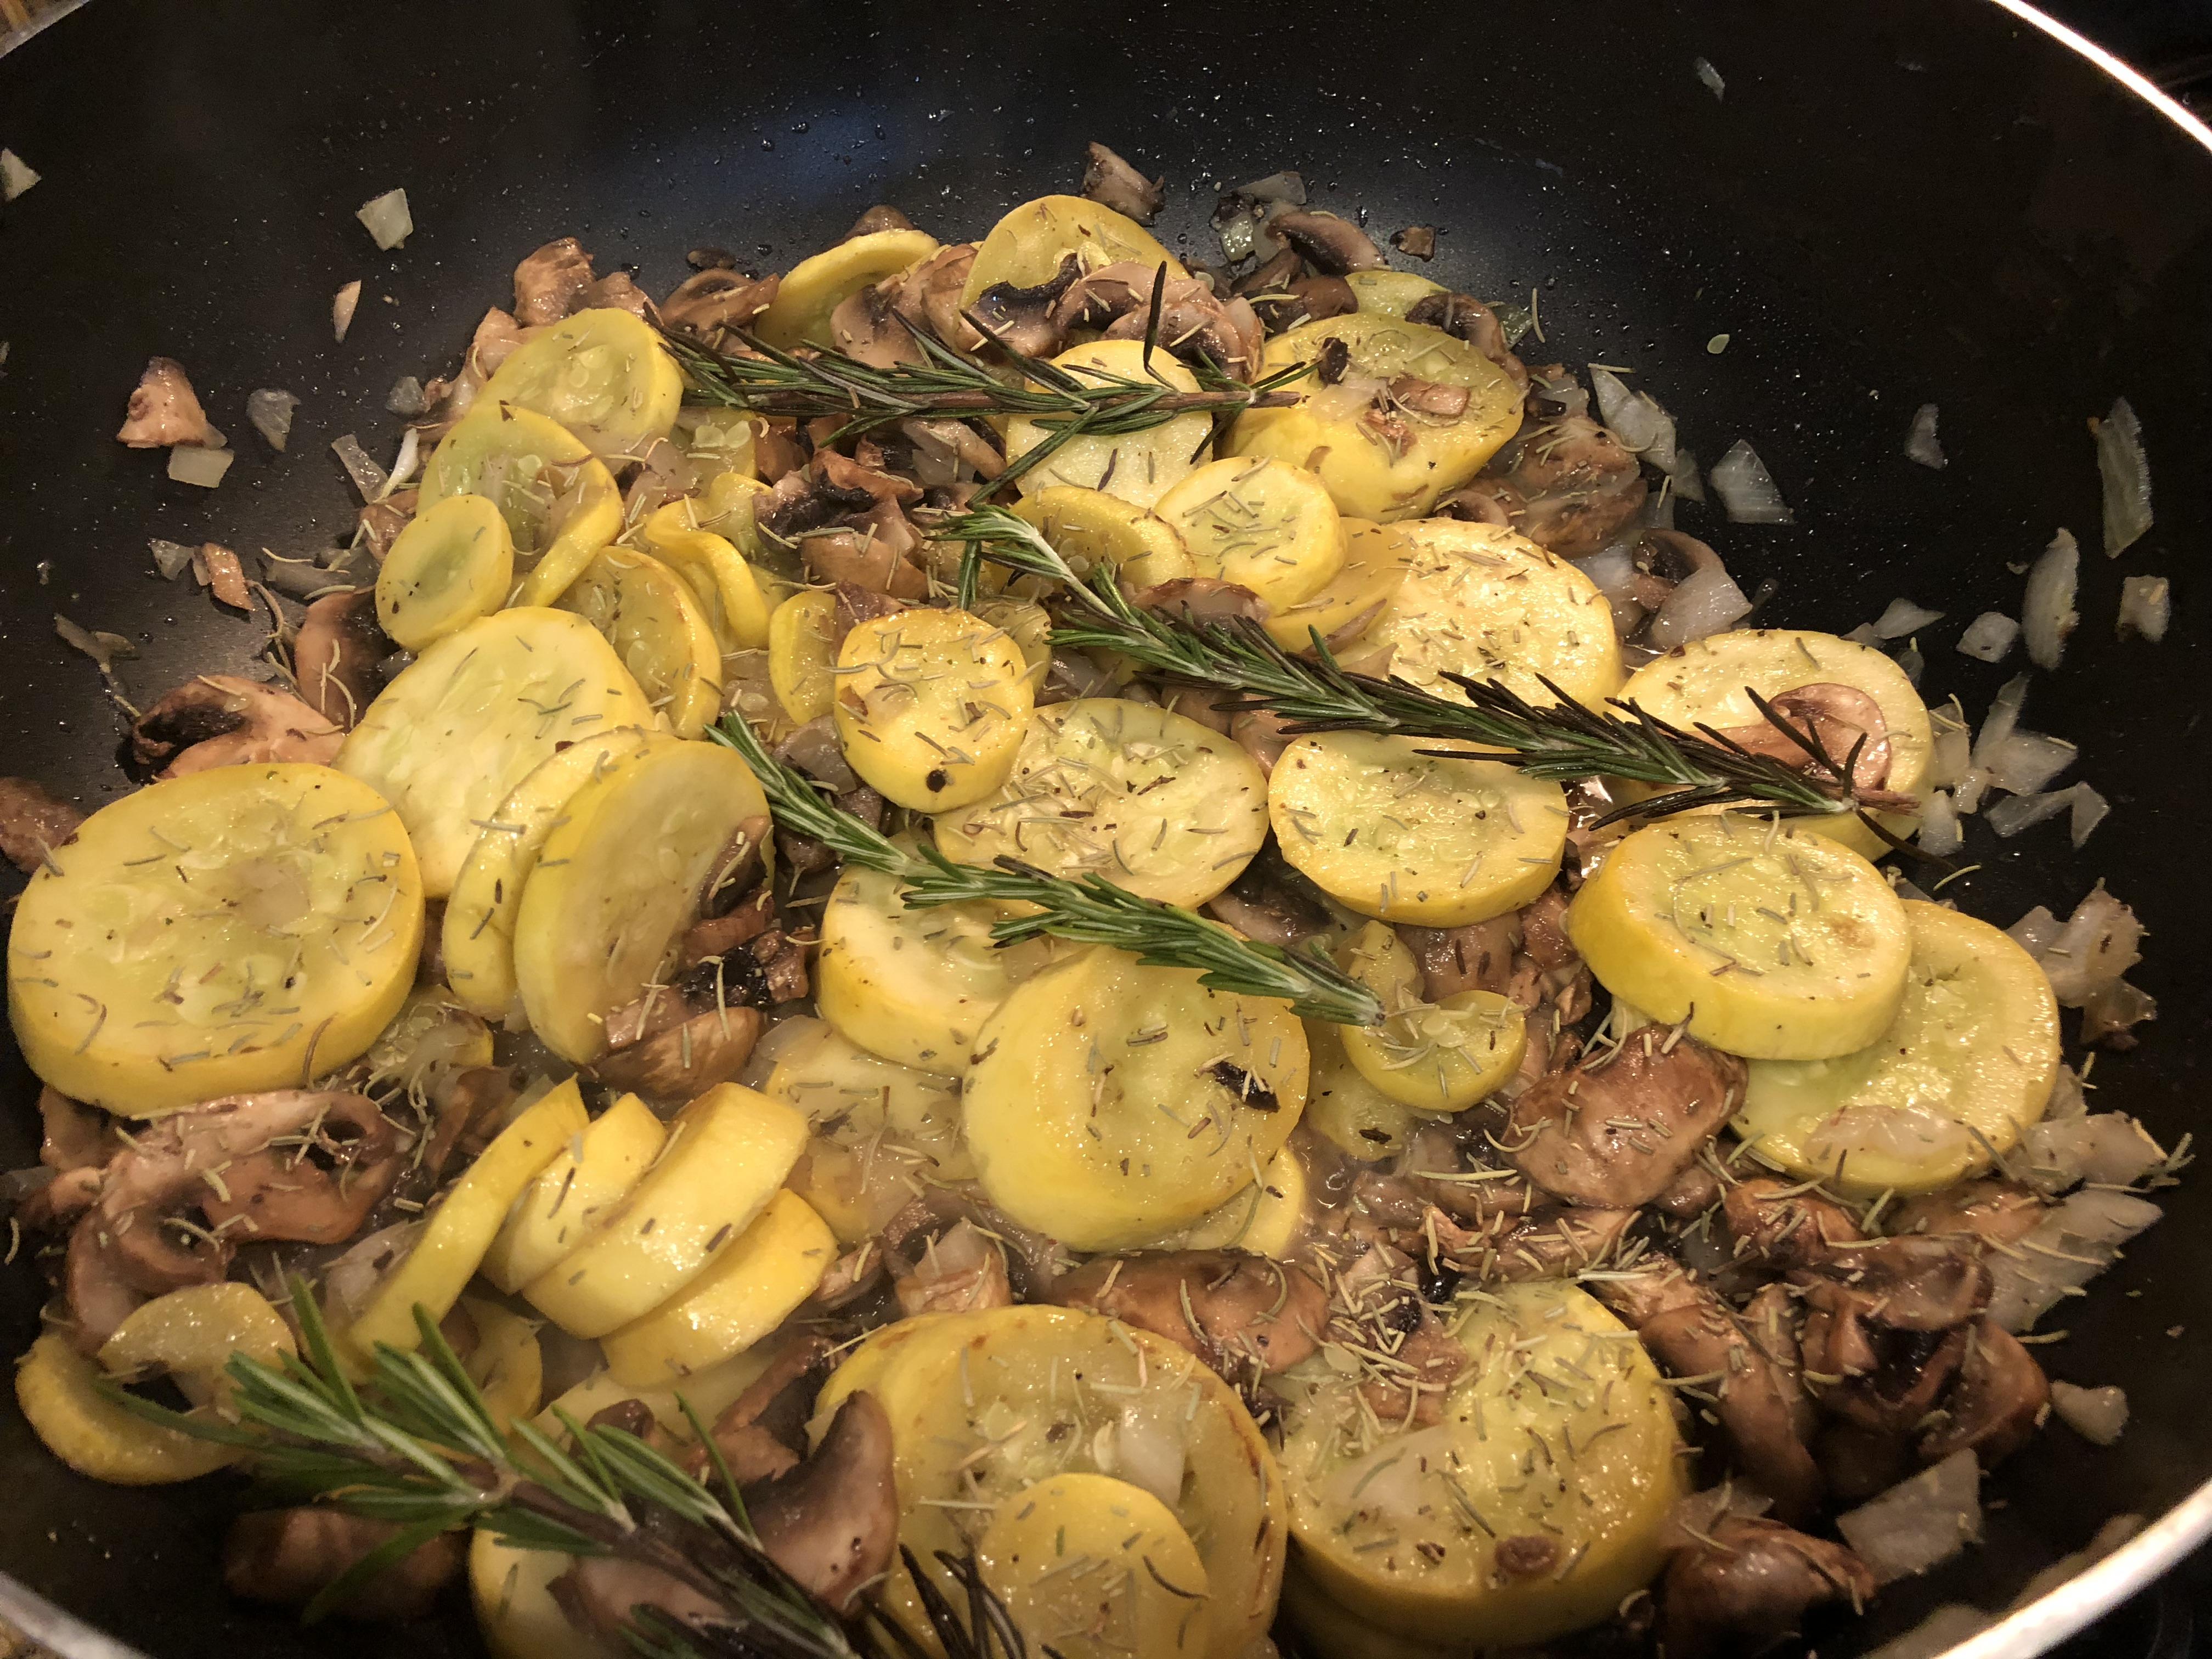 Fried Yellow Squash and Mushrooms